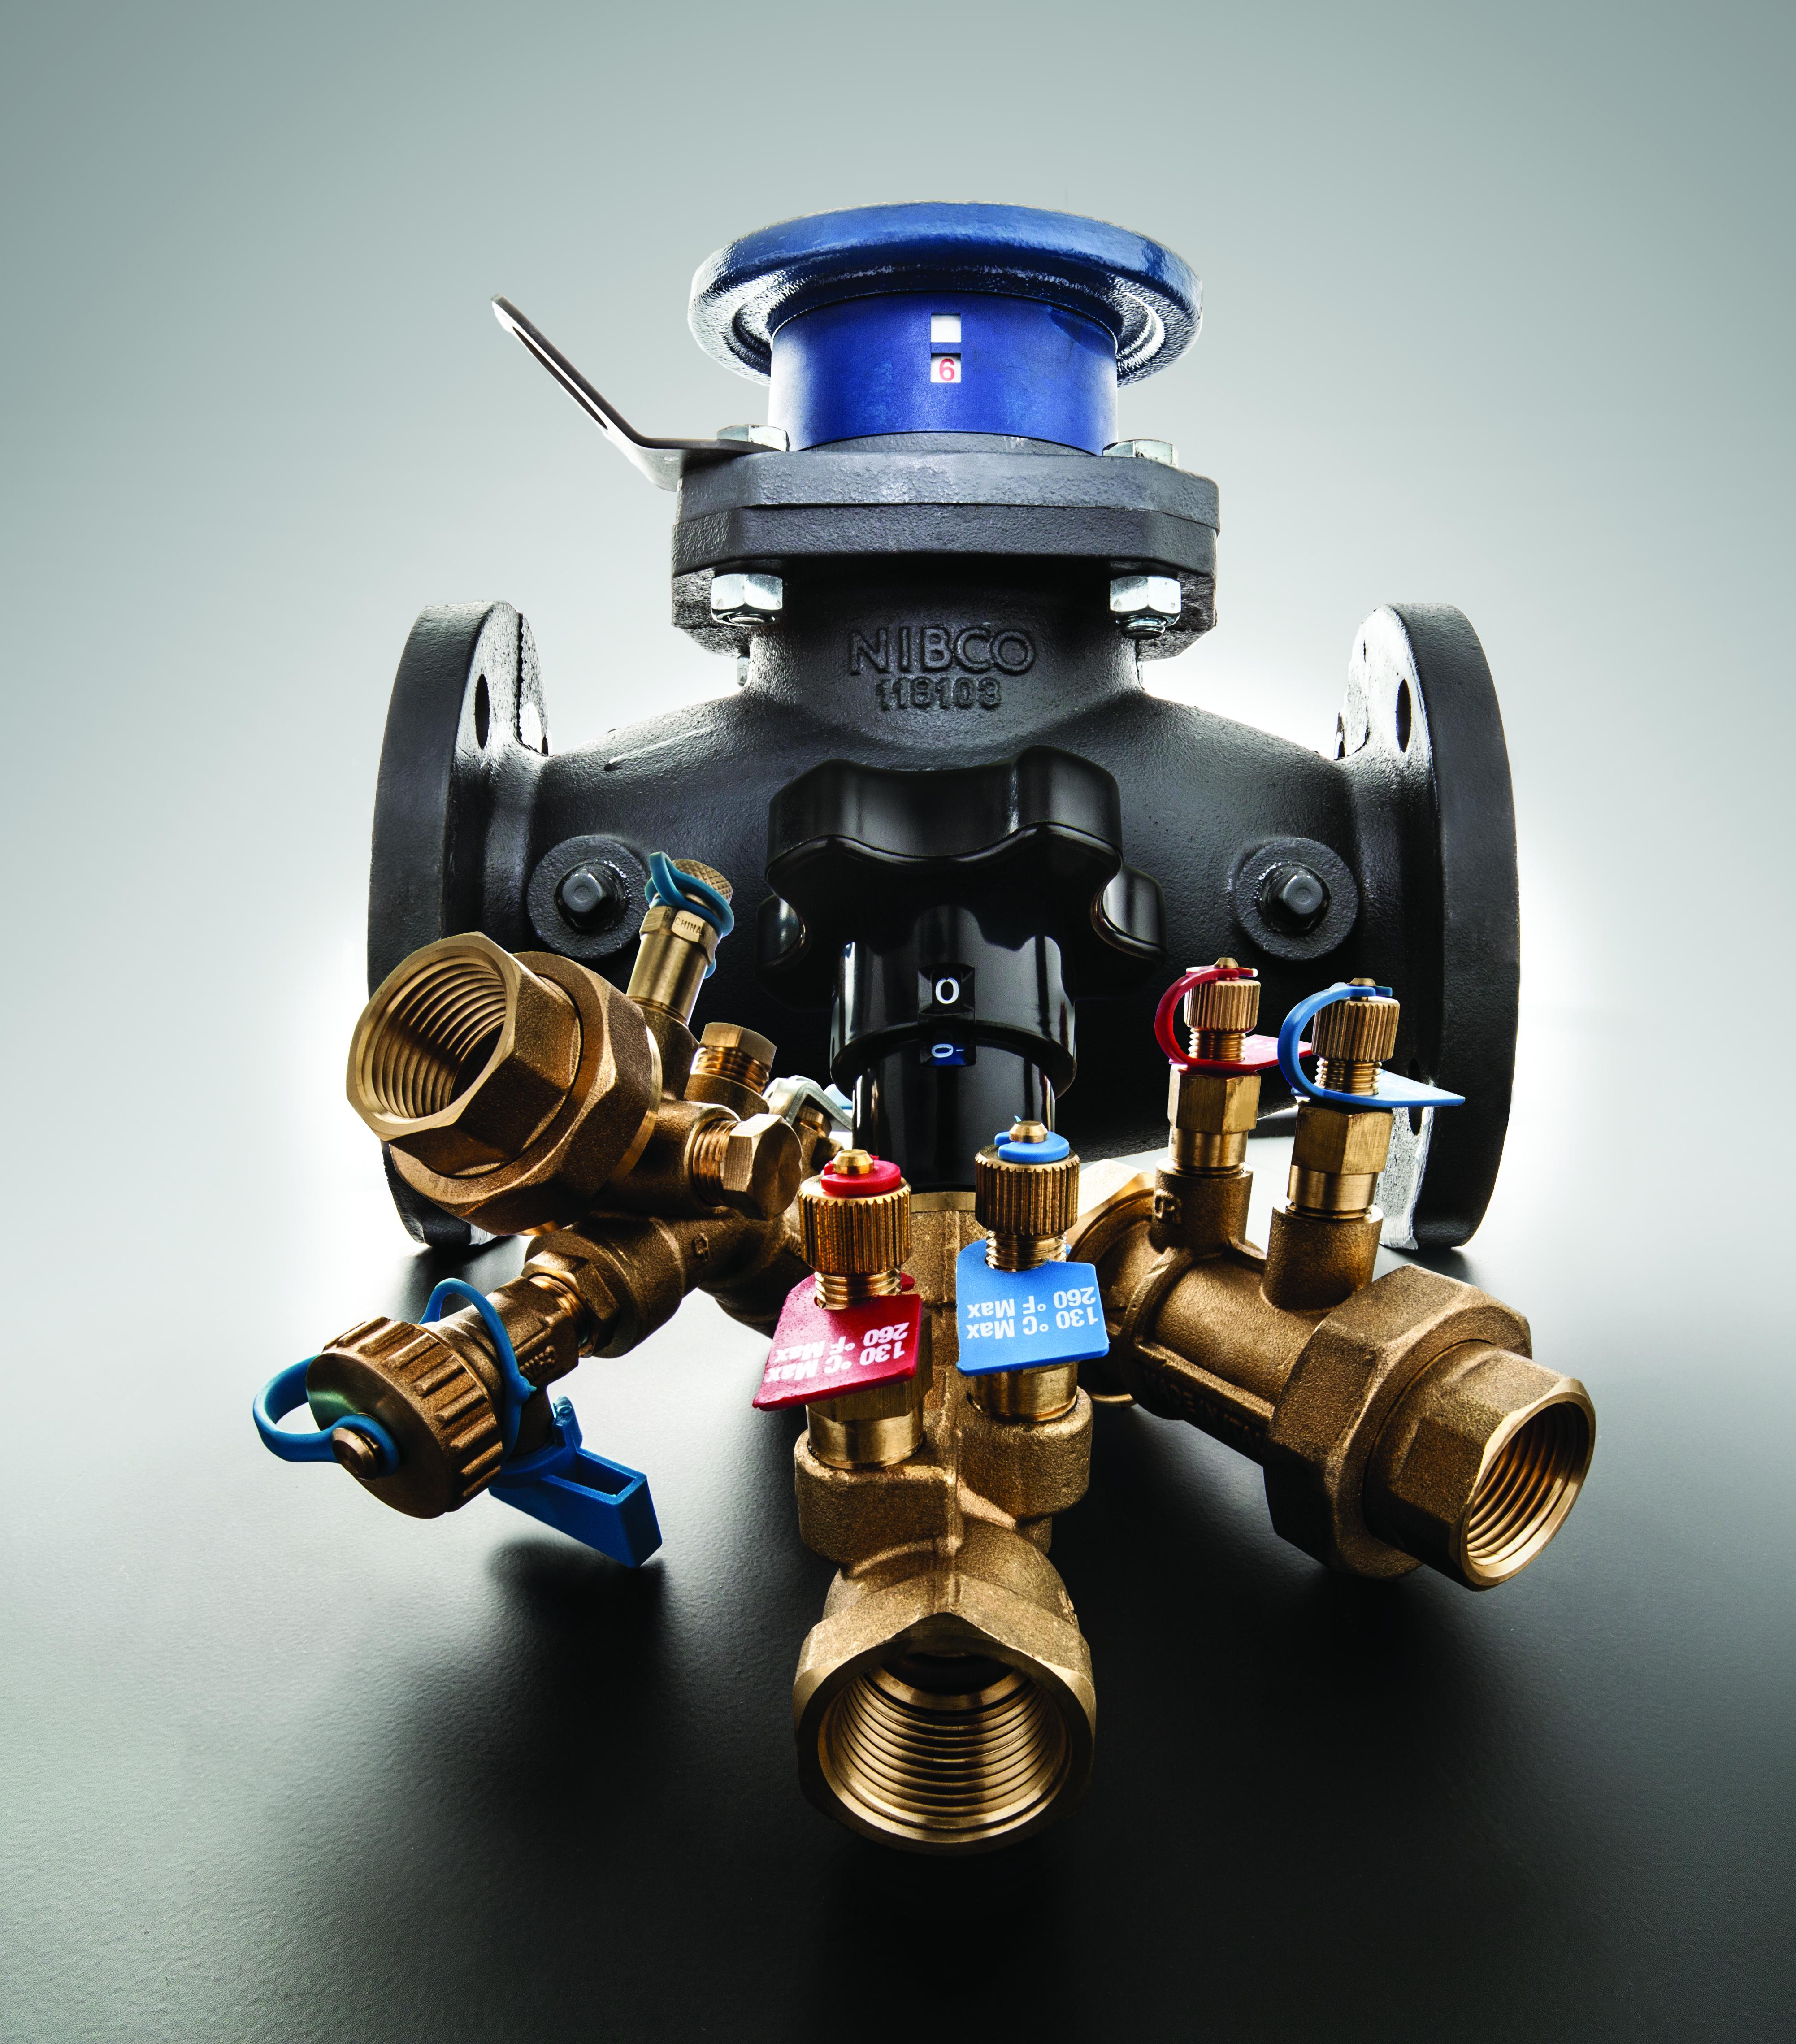 Balancing valves FLO-BOSS NIBCO